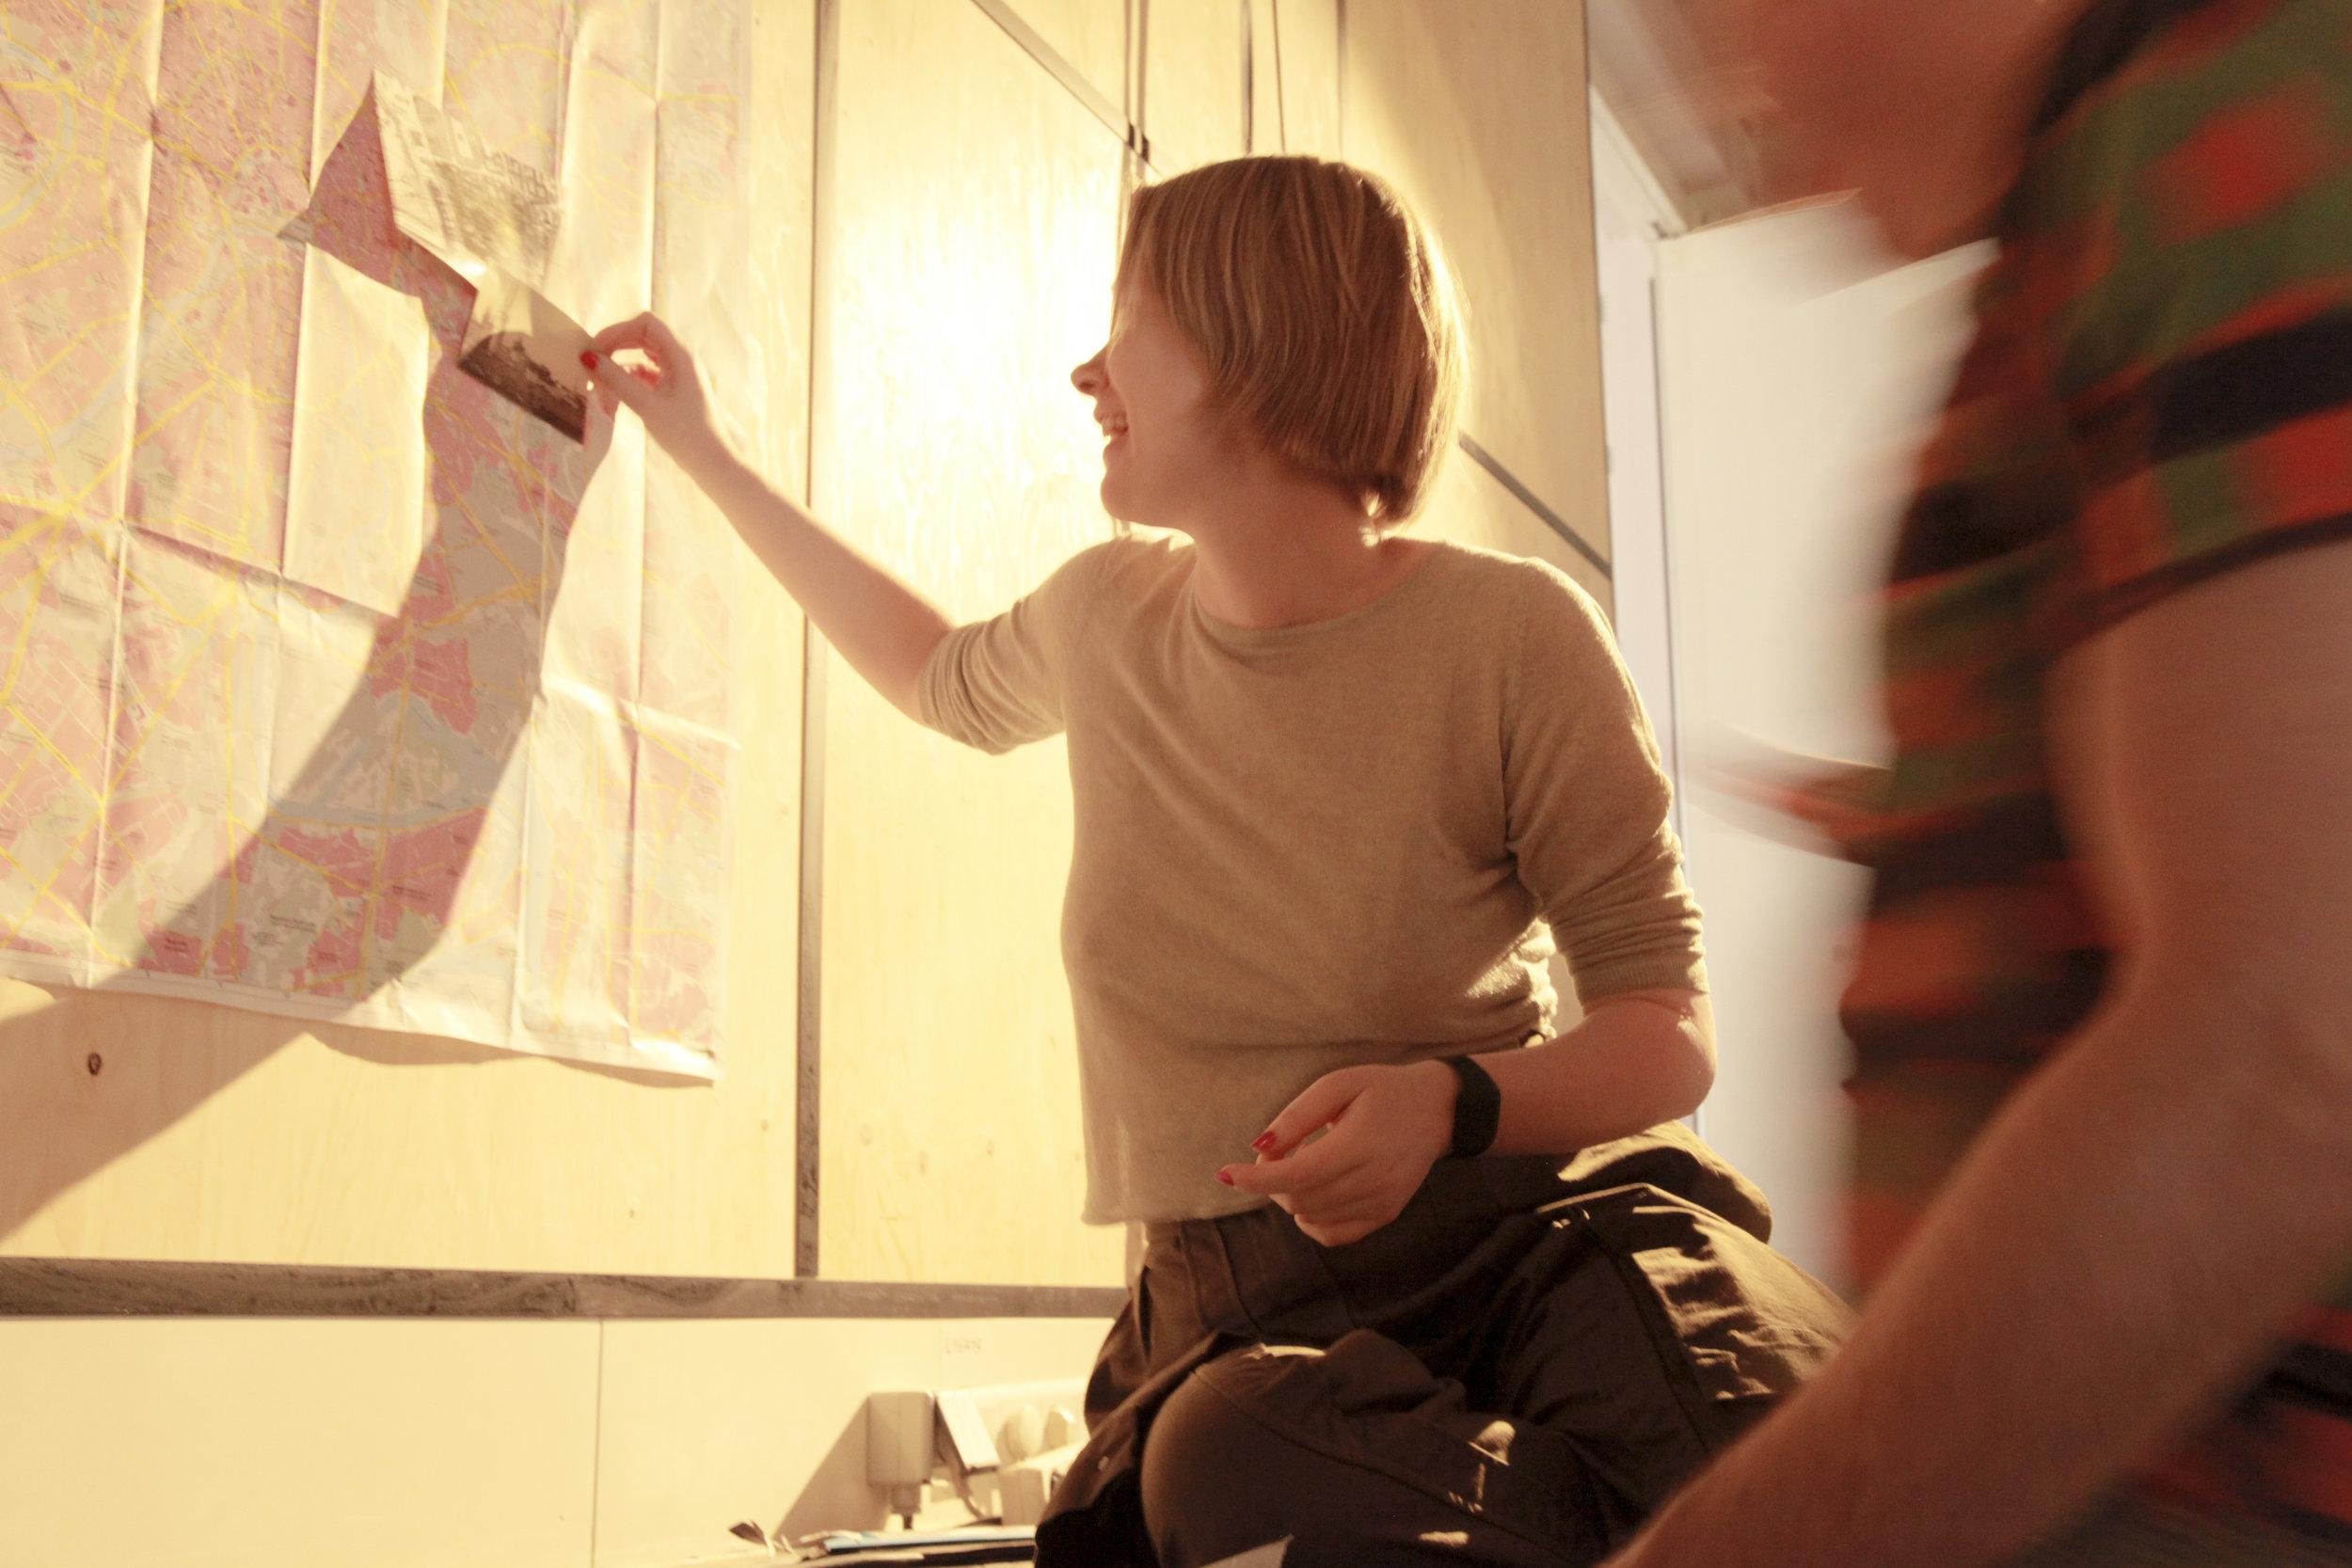 Hanna's preparation of her installation Portaal 1012 during PLOV #2 ARTxFOODxCINEMA, celebrated on 19 June 2018 at Studio/K, Amsterdam © Juan Aguirre Fernández-Bravo